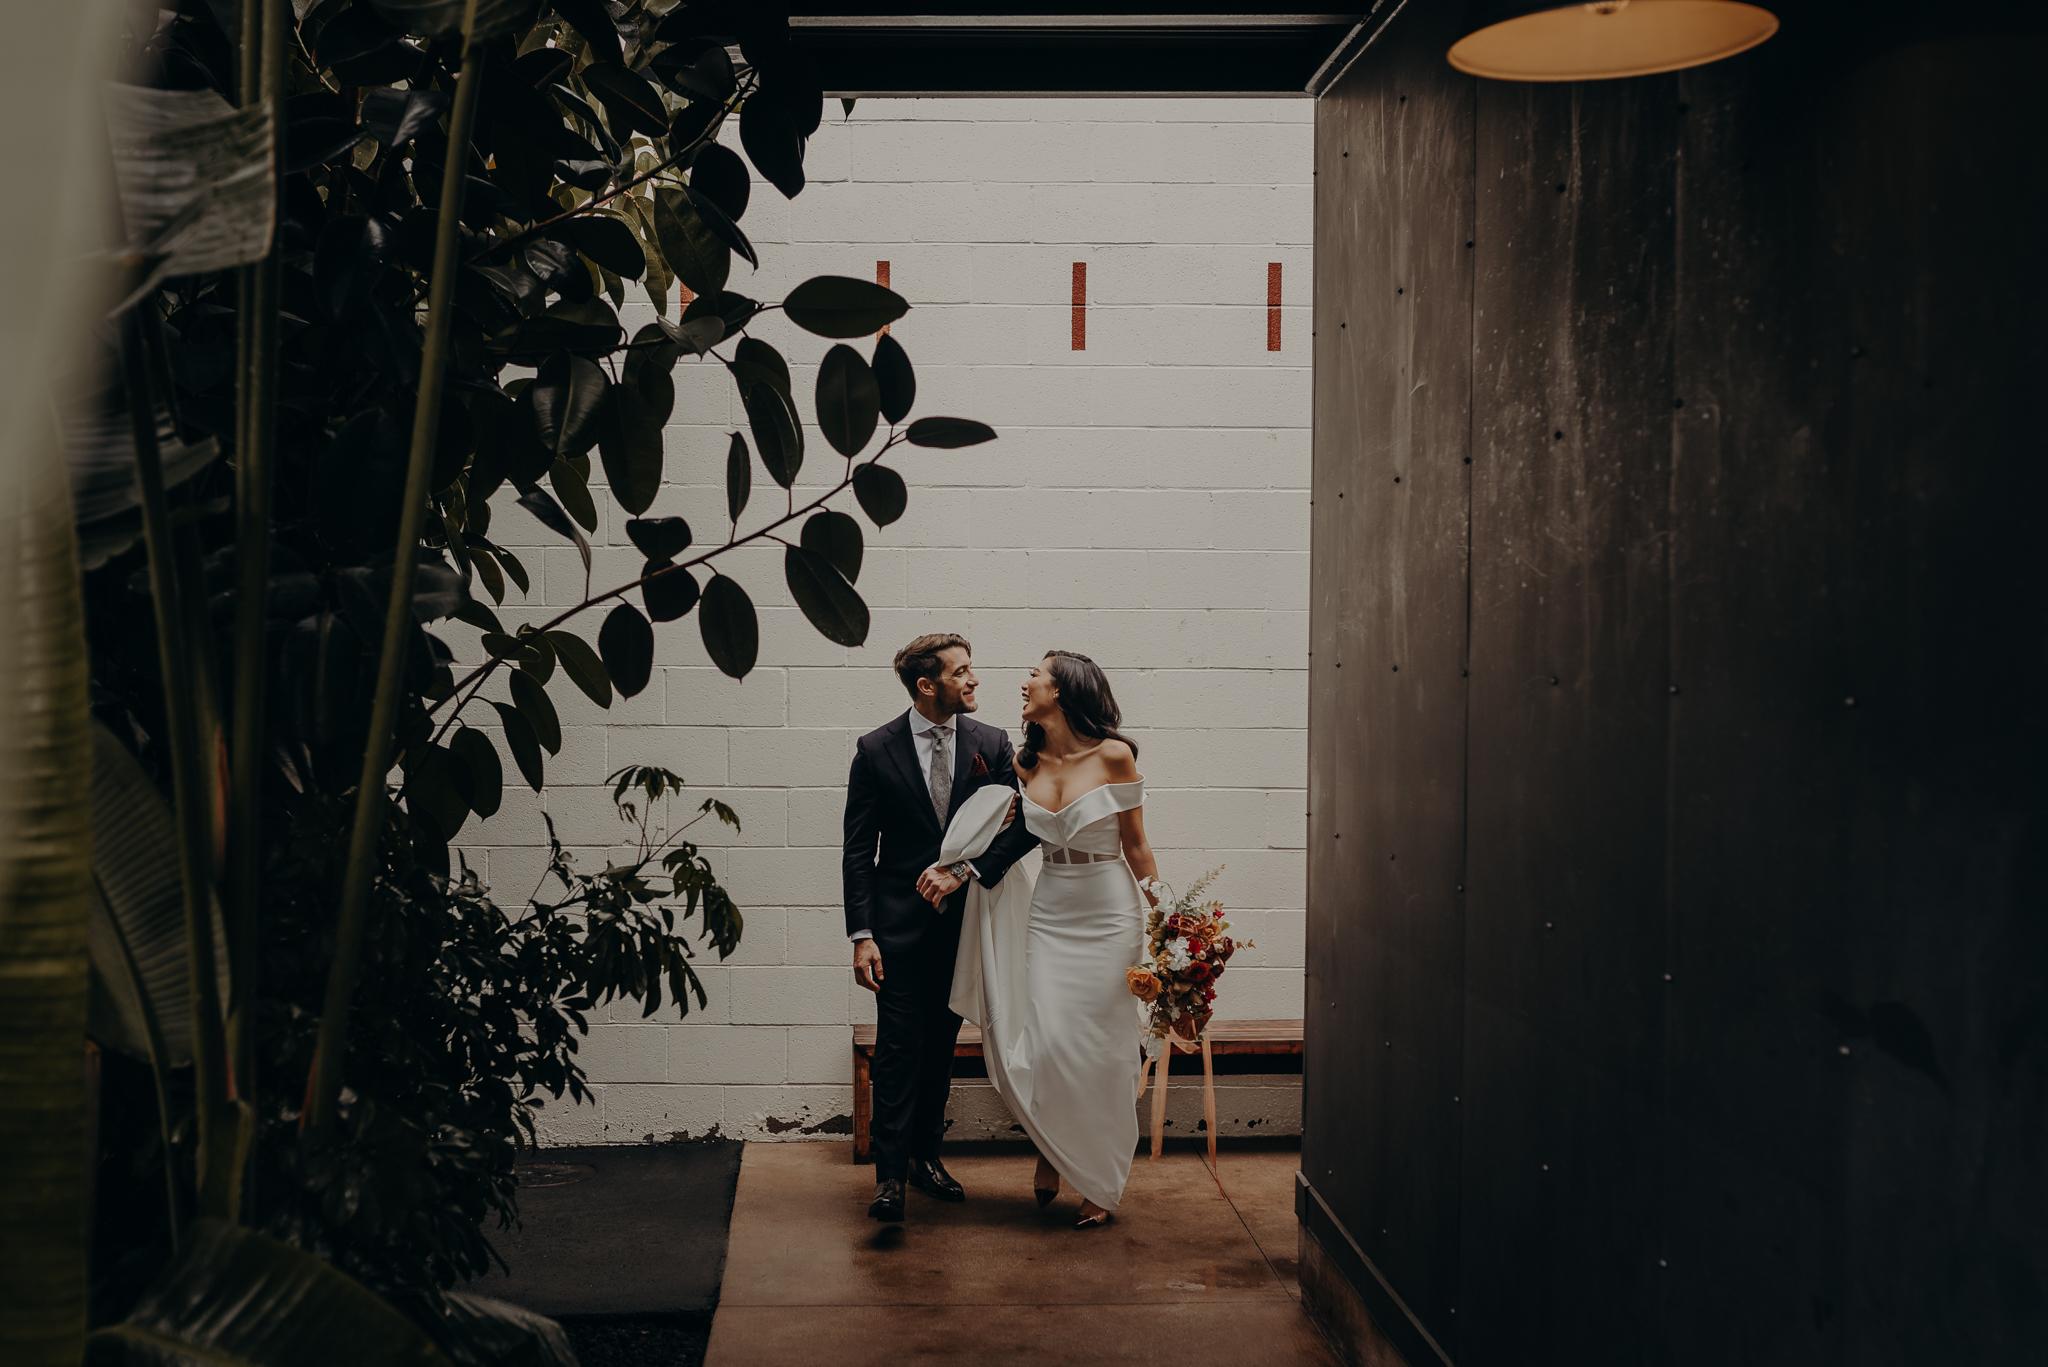 Wedding Photo LA - wedding photographer in los angeles - millwick wedding venue -isaiahandtaylor.com-061.jpg